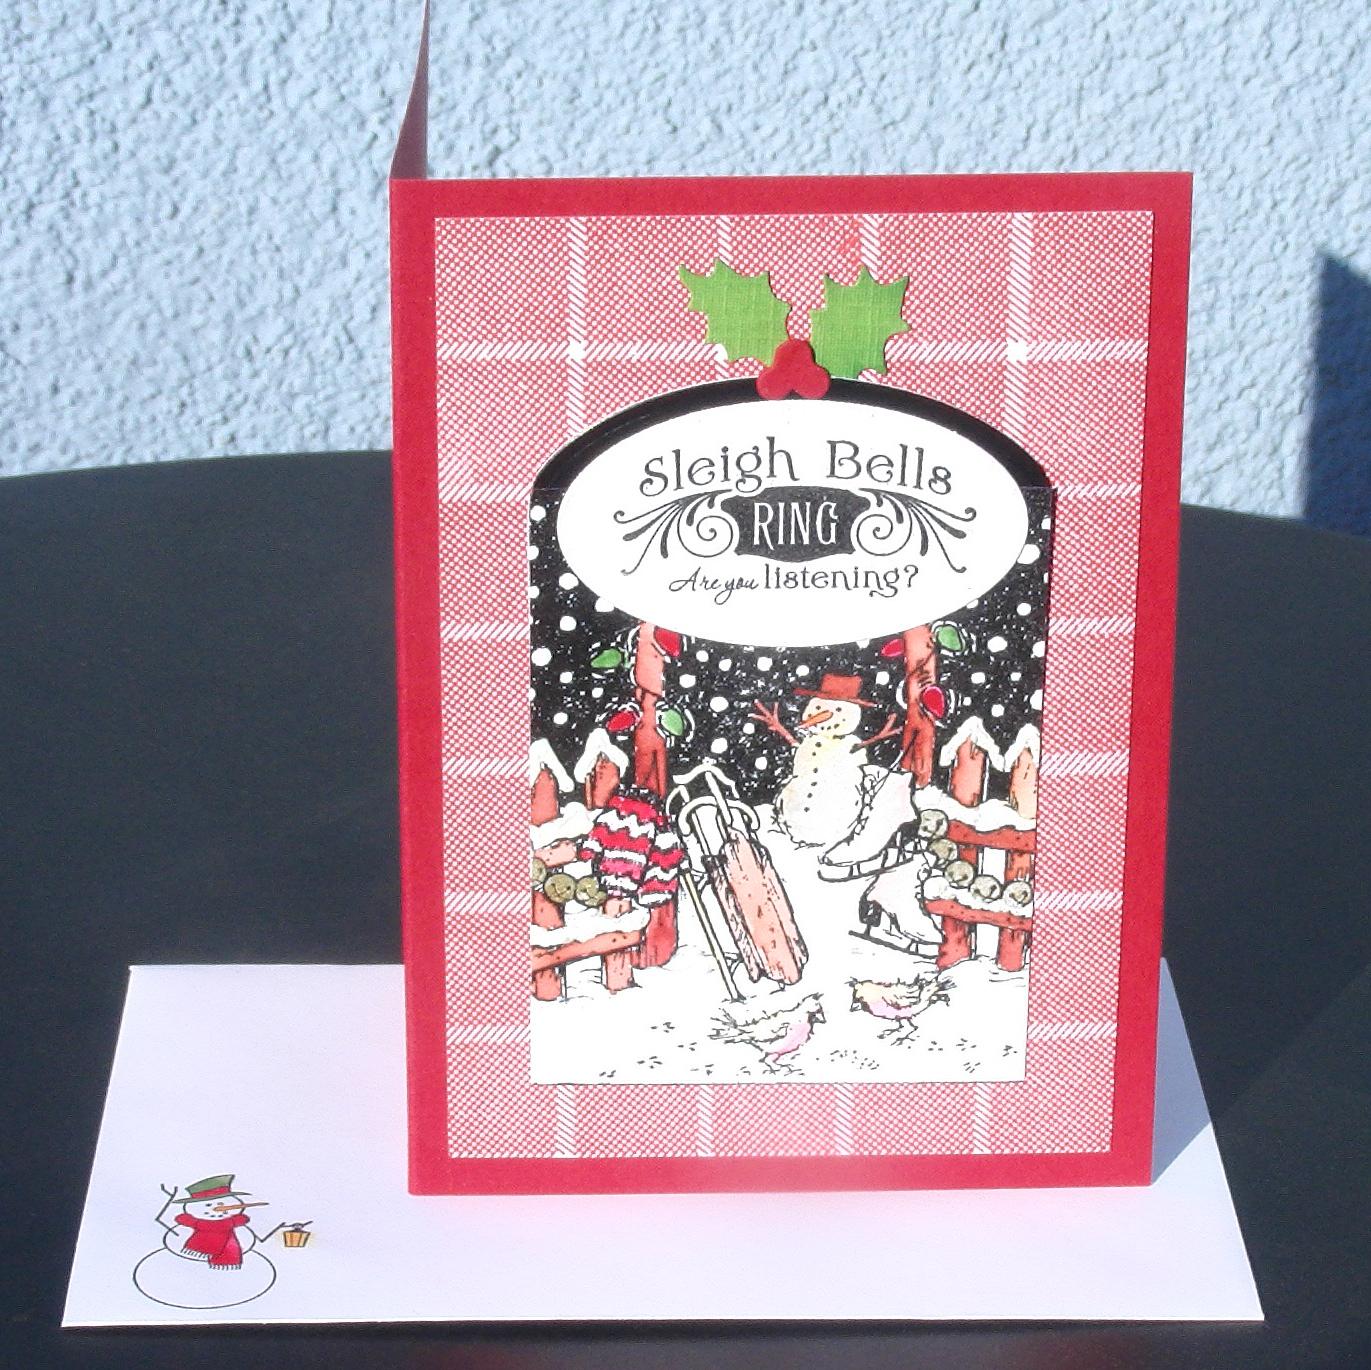 http://4.bp.blogspot.com/-2BNRAUh4-E8/UD-UHM98i-I/AAAAAAAAAis/hfYmIhOSm-I/s1600/Card+Sleigh+Bells+Ring.JPG